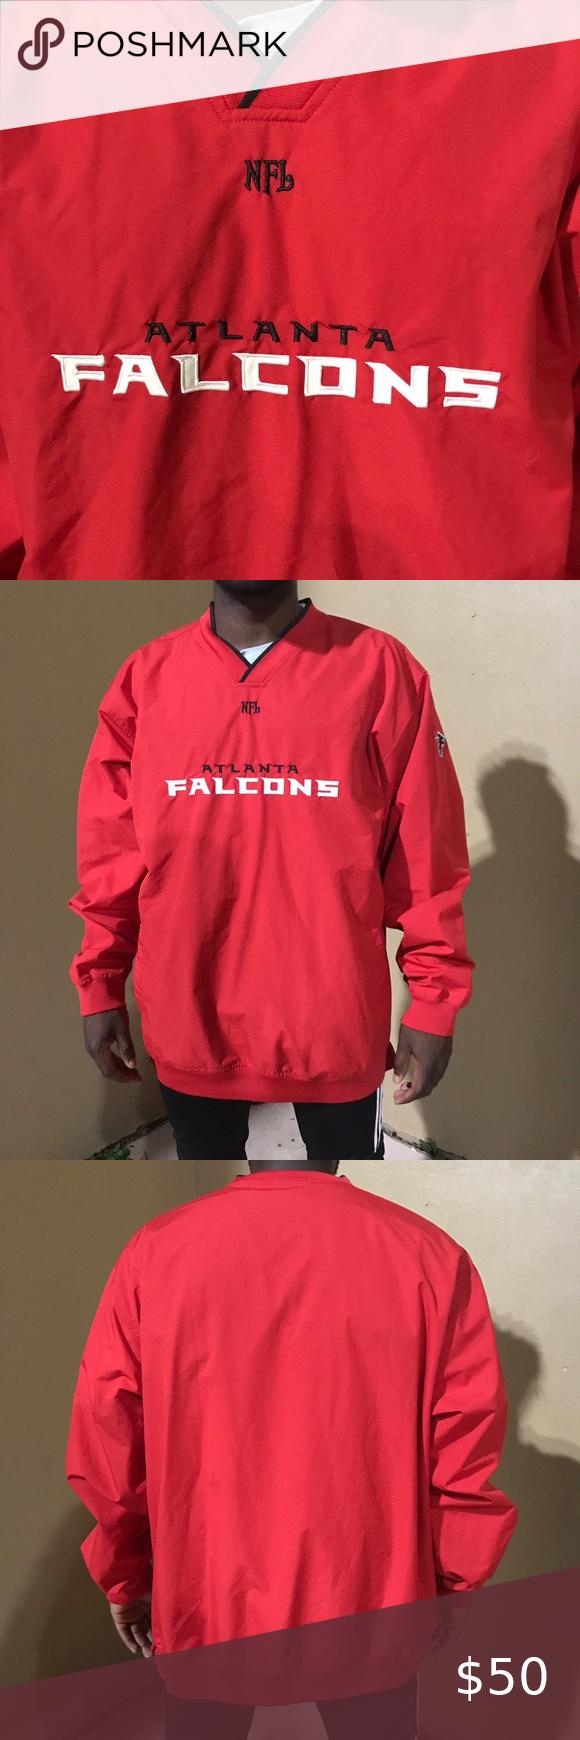 Vintage Nfl Reebok Atlanta Falcons Pullover Clothes Design Pullover Fashion Design [ 1740 x 580 Pixel ]